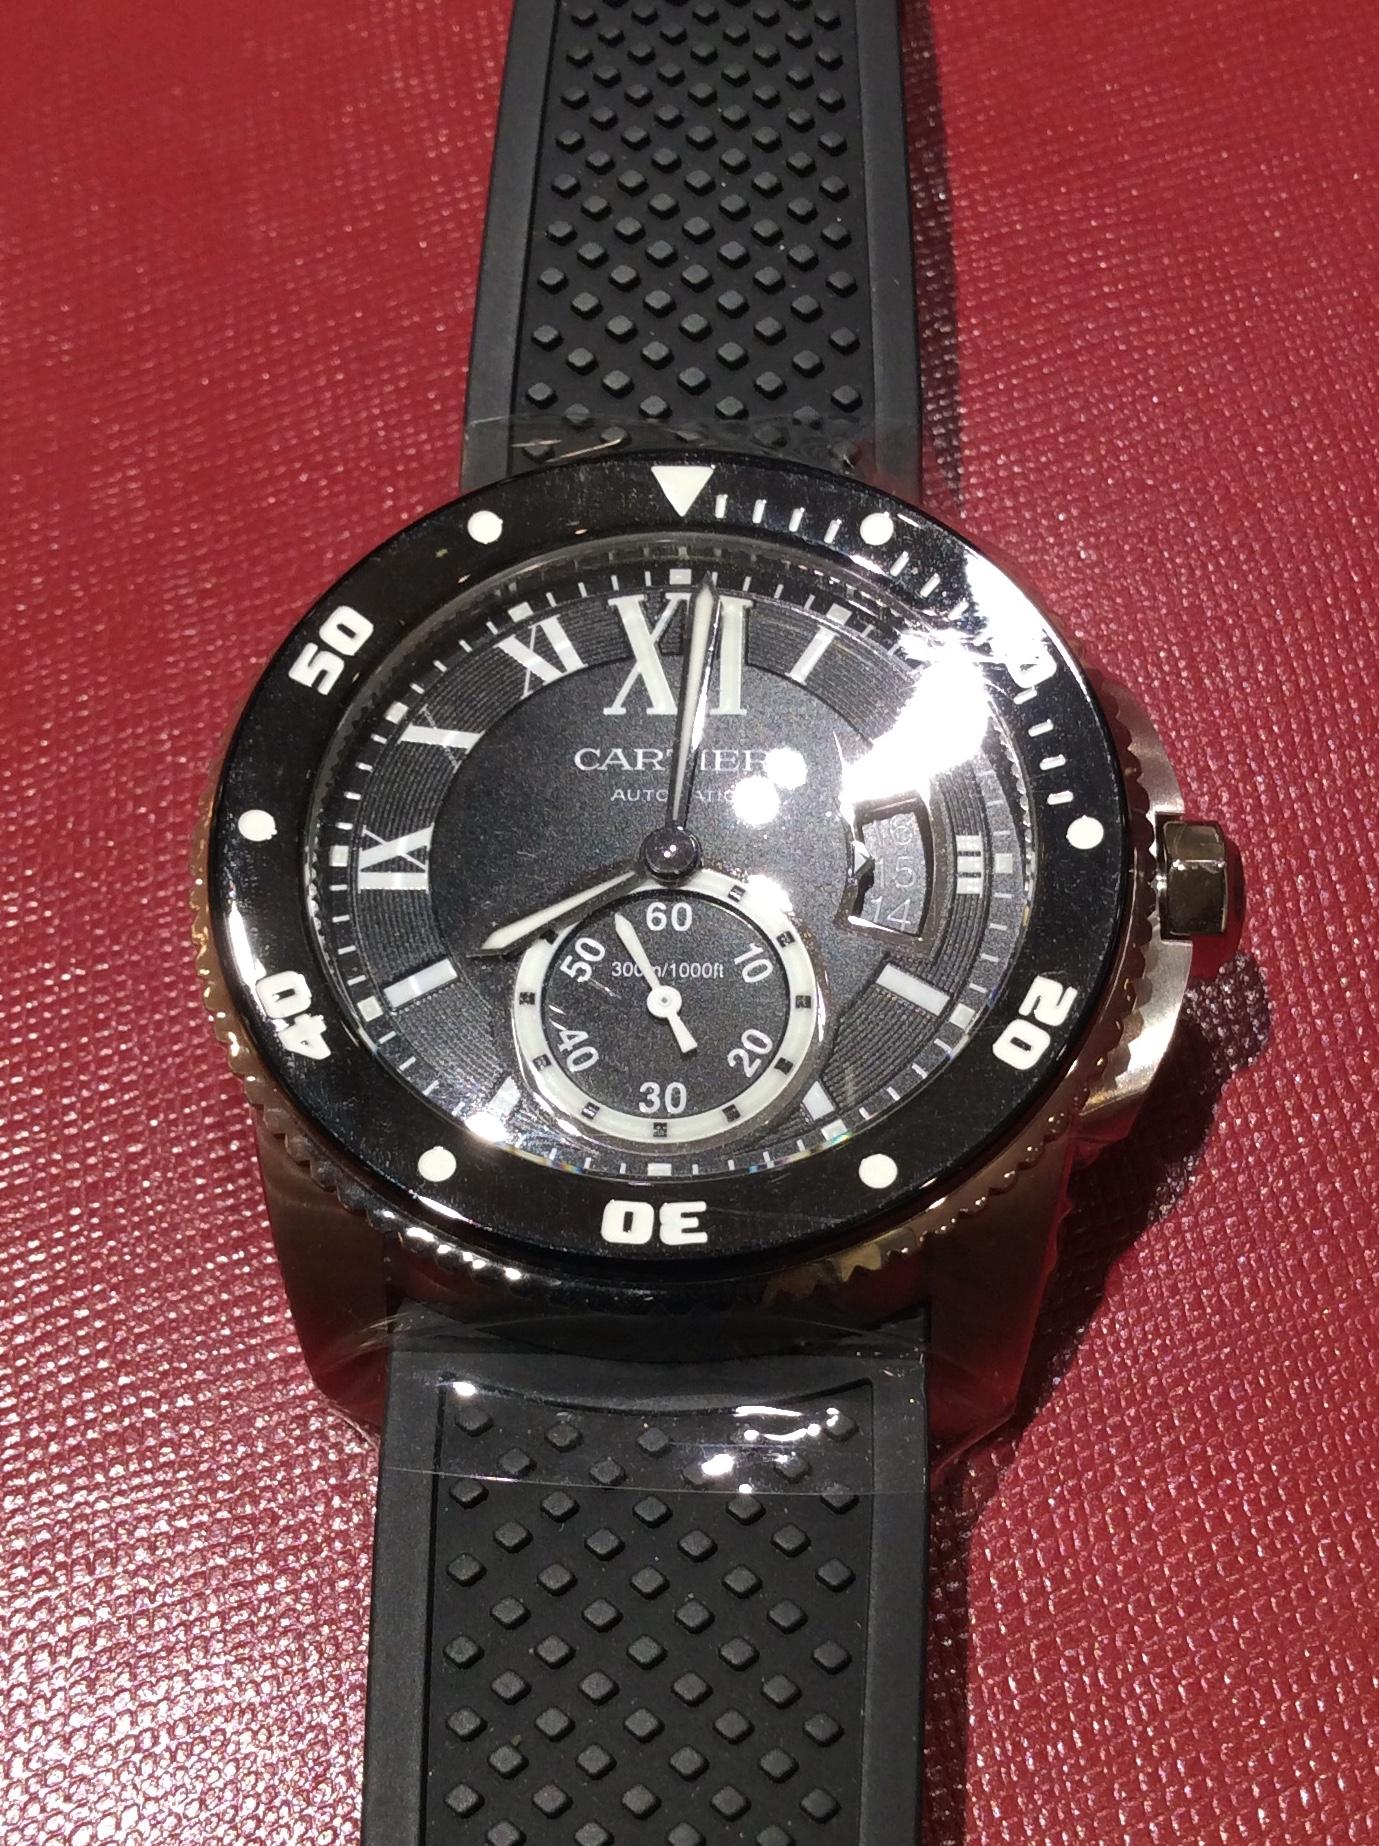 cfff95ec34 カルティエ(Cartier) カリブル ドゥ カルティエ ダイバー ウォッチ Calibre de Cartier Diver watch |  ブランド腕時計の正規販売店紹介サイトGressive/グレッシブ